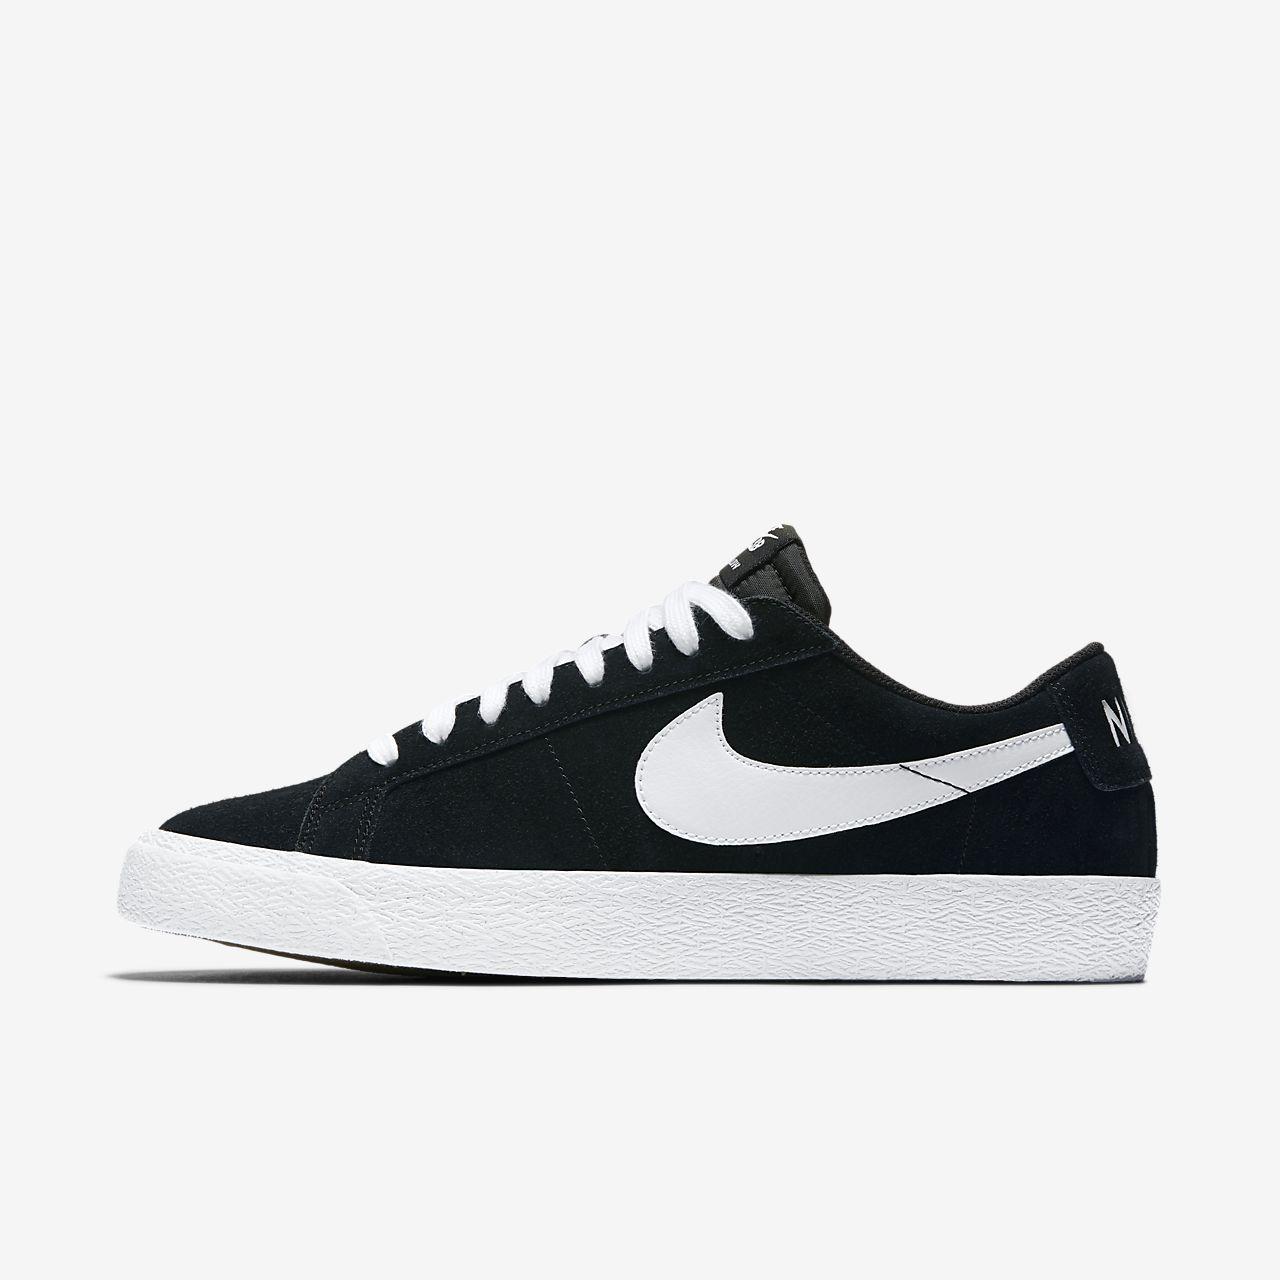 size 40 84f3c 197de Skateboardsko Nike SB Blazer Zoom Low för män